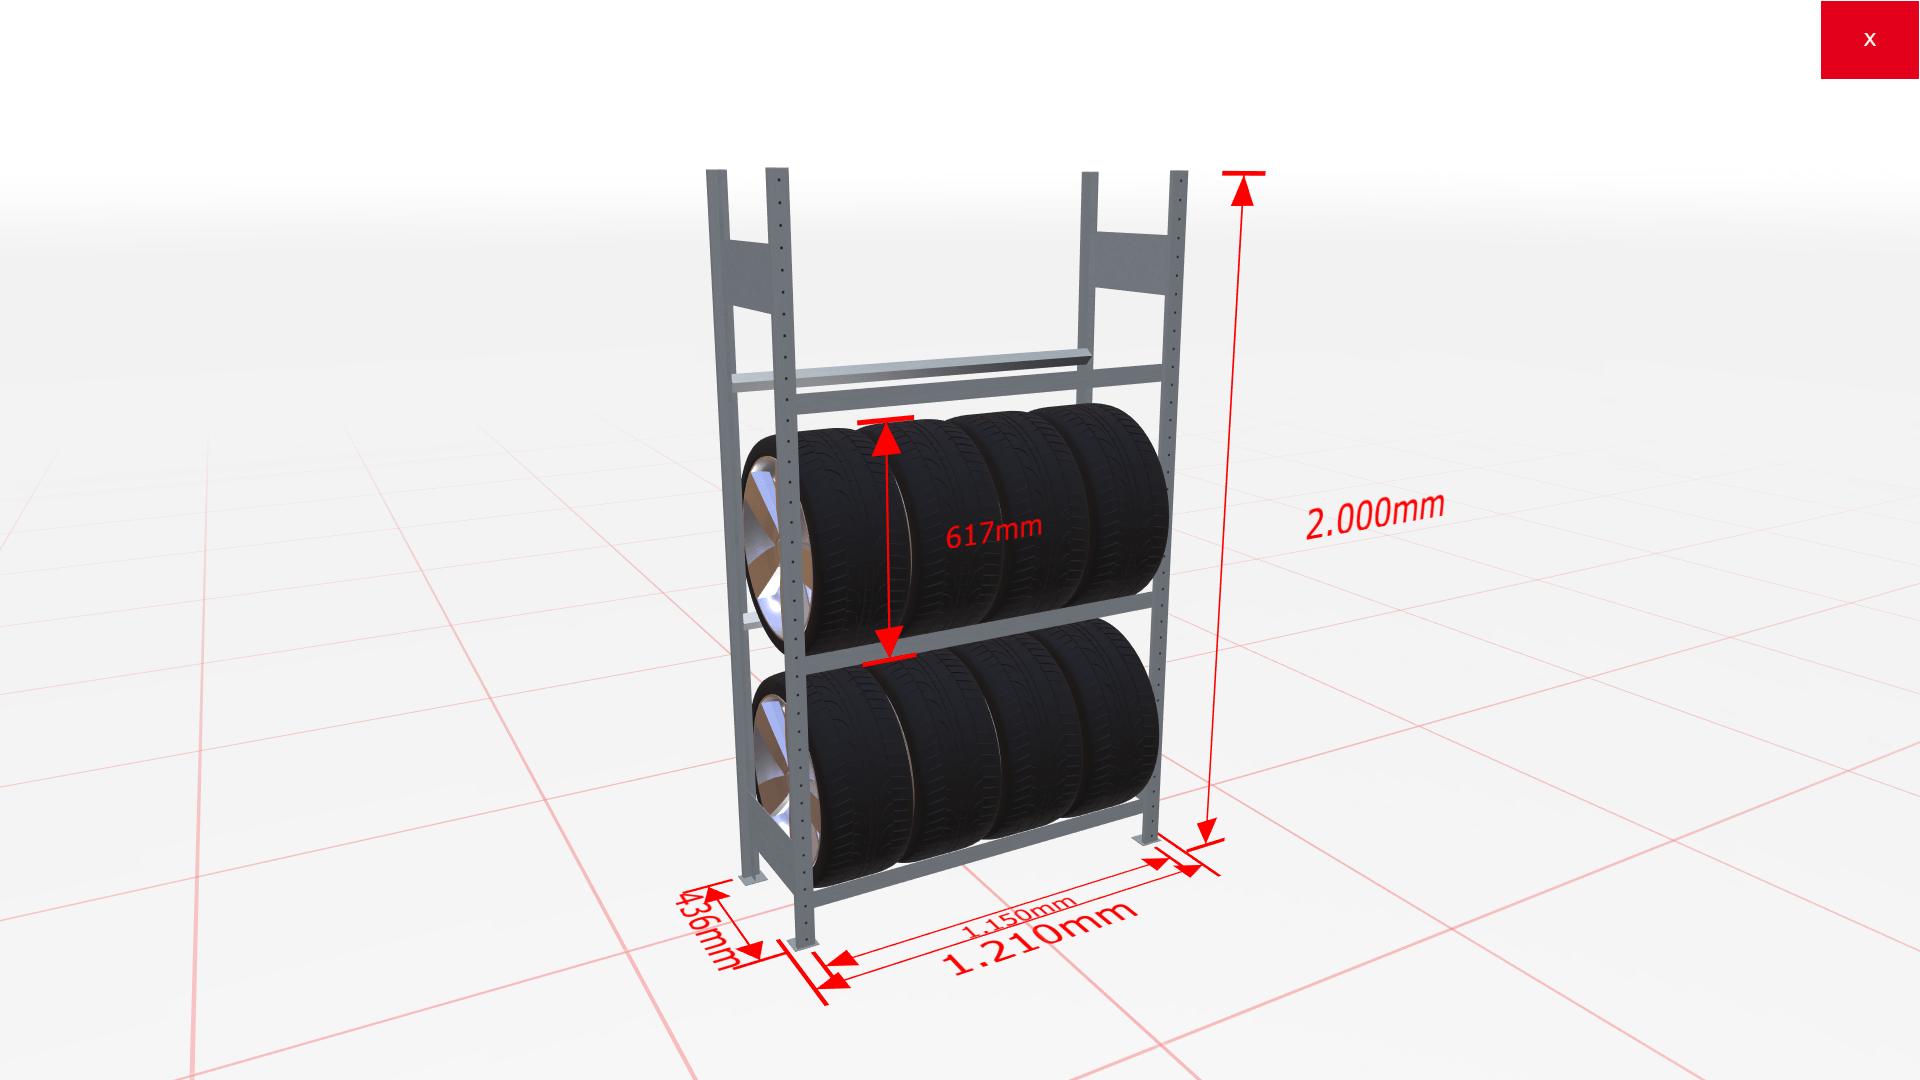 Räderregal Grundregal SCHULTE Lagertechnik 2000x1150x400 mm – 3 Ebenen á 1150 mm, verzinkt